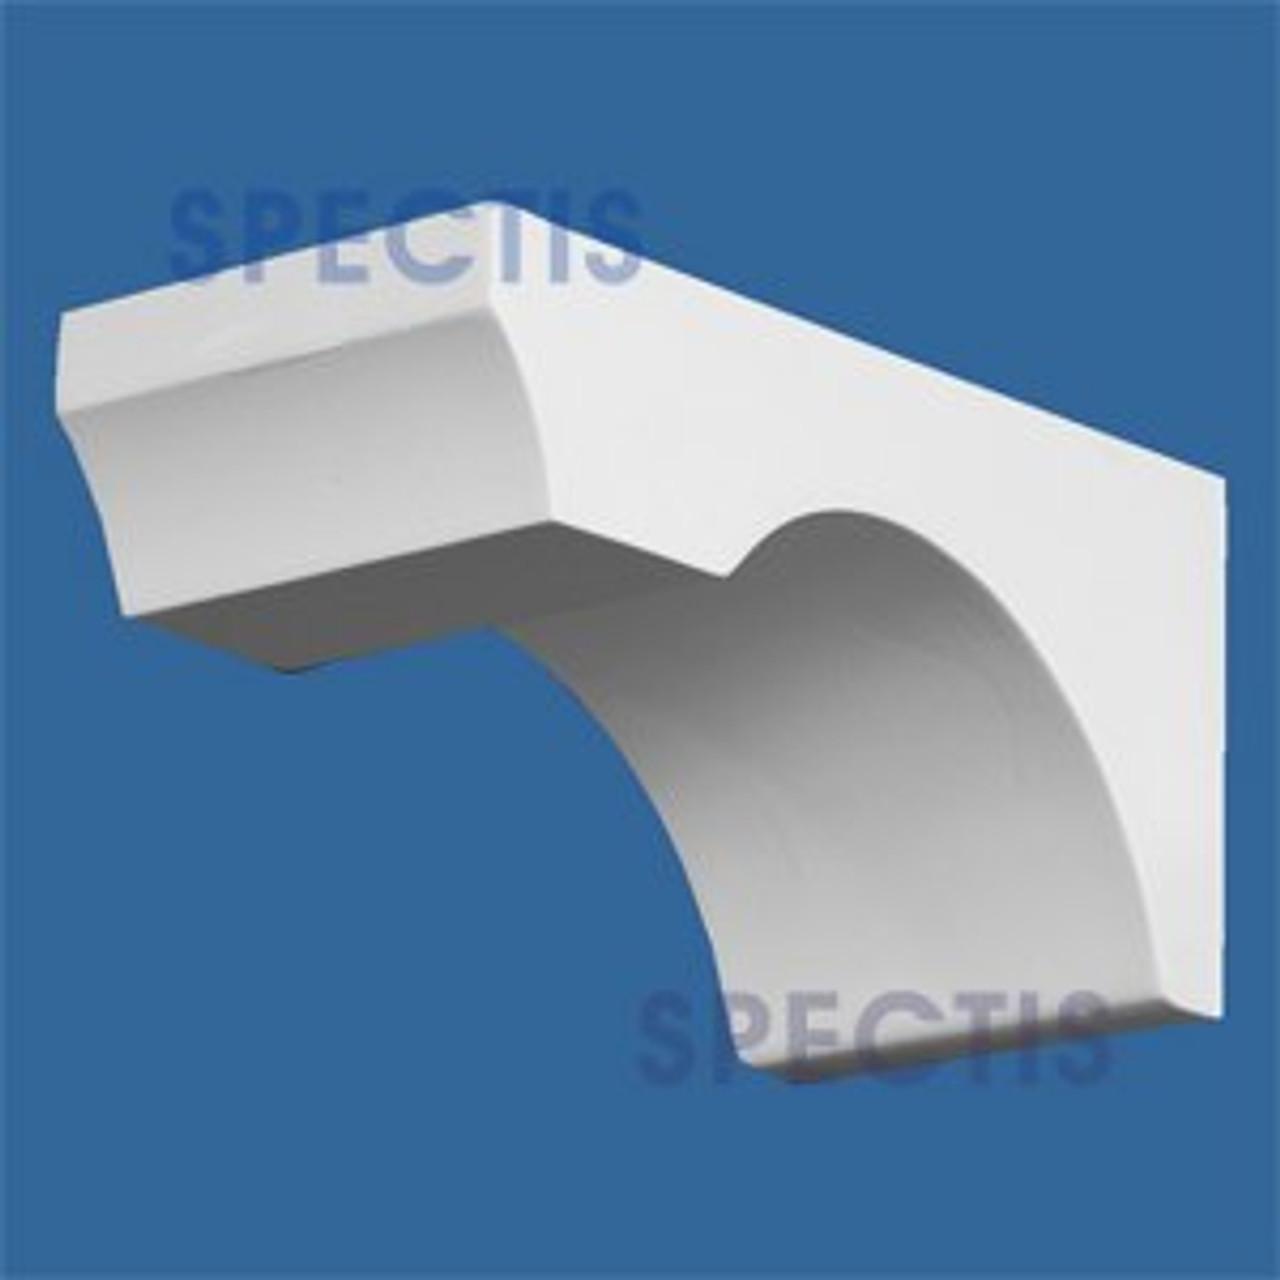 "BL2667 Corbel Block or Eave Bracket 3.75""W x 3.9""H x 7.5"" P"